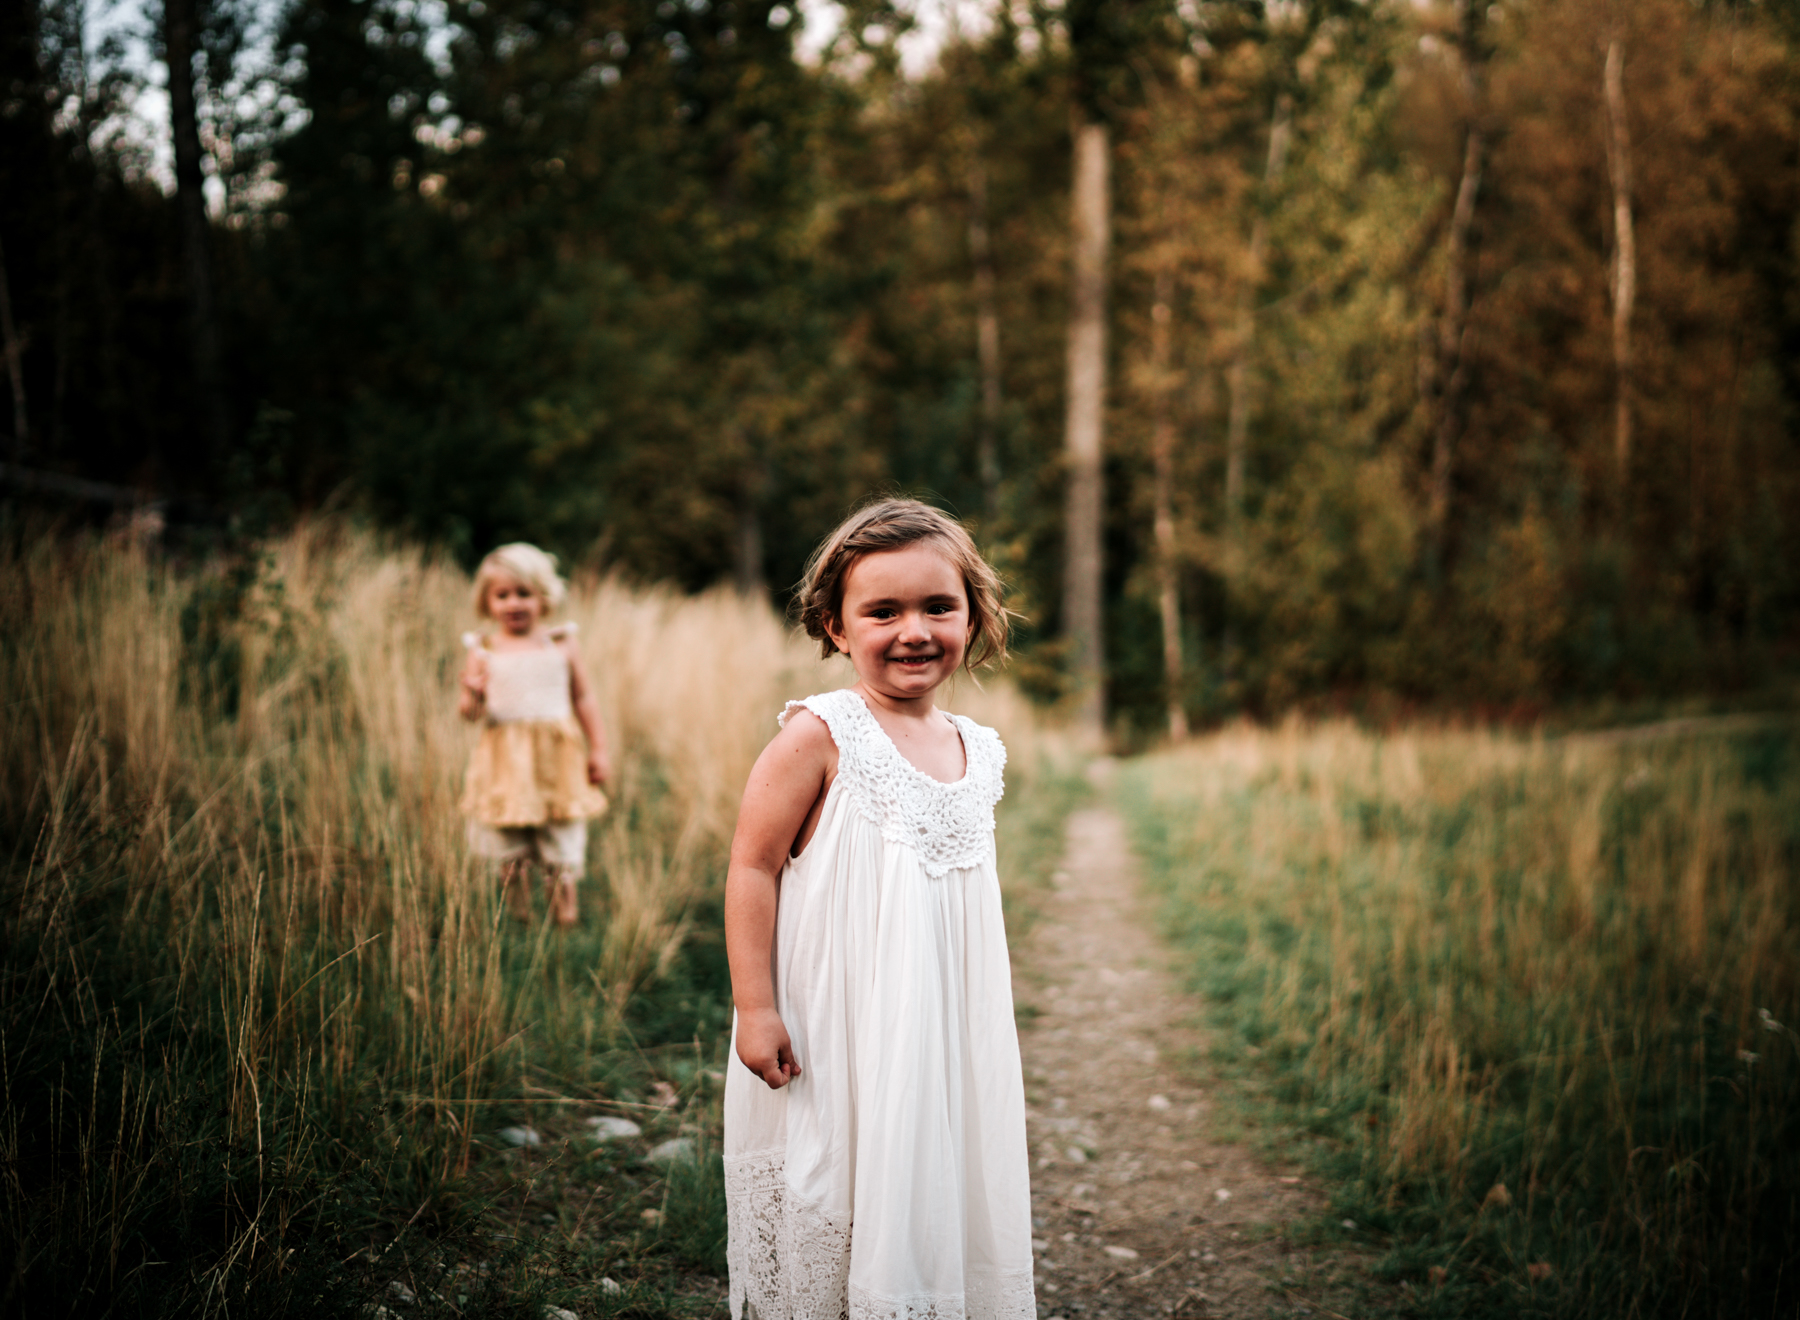 anchoragefamilyphotographer2.jpg